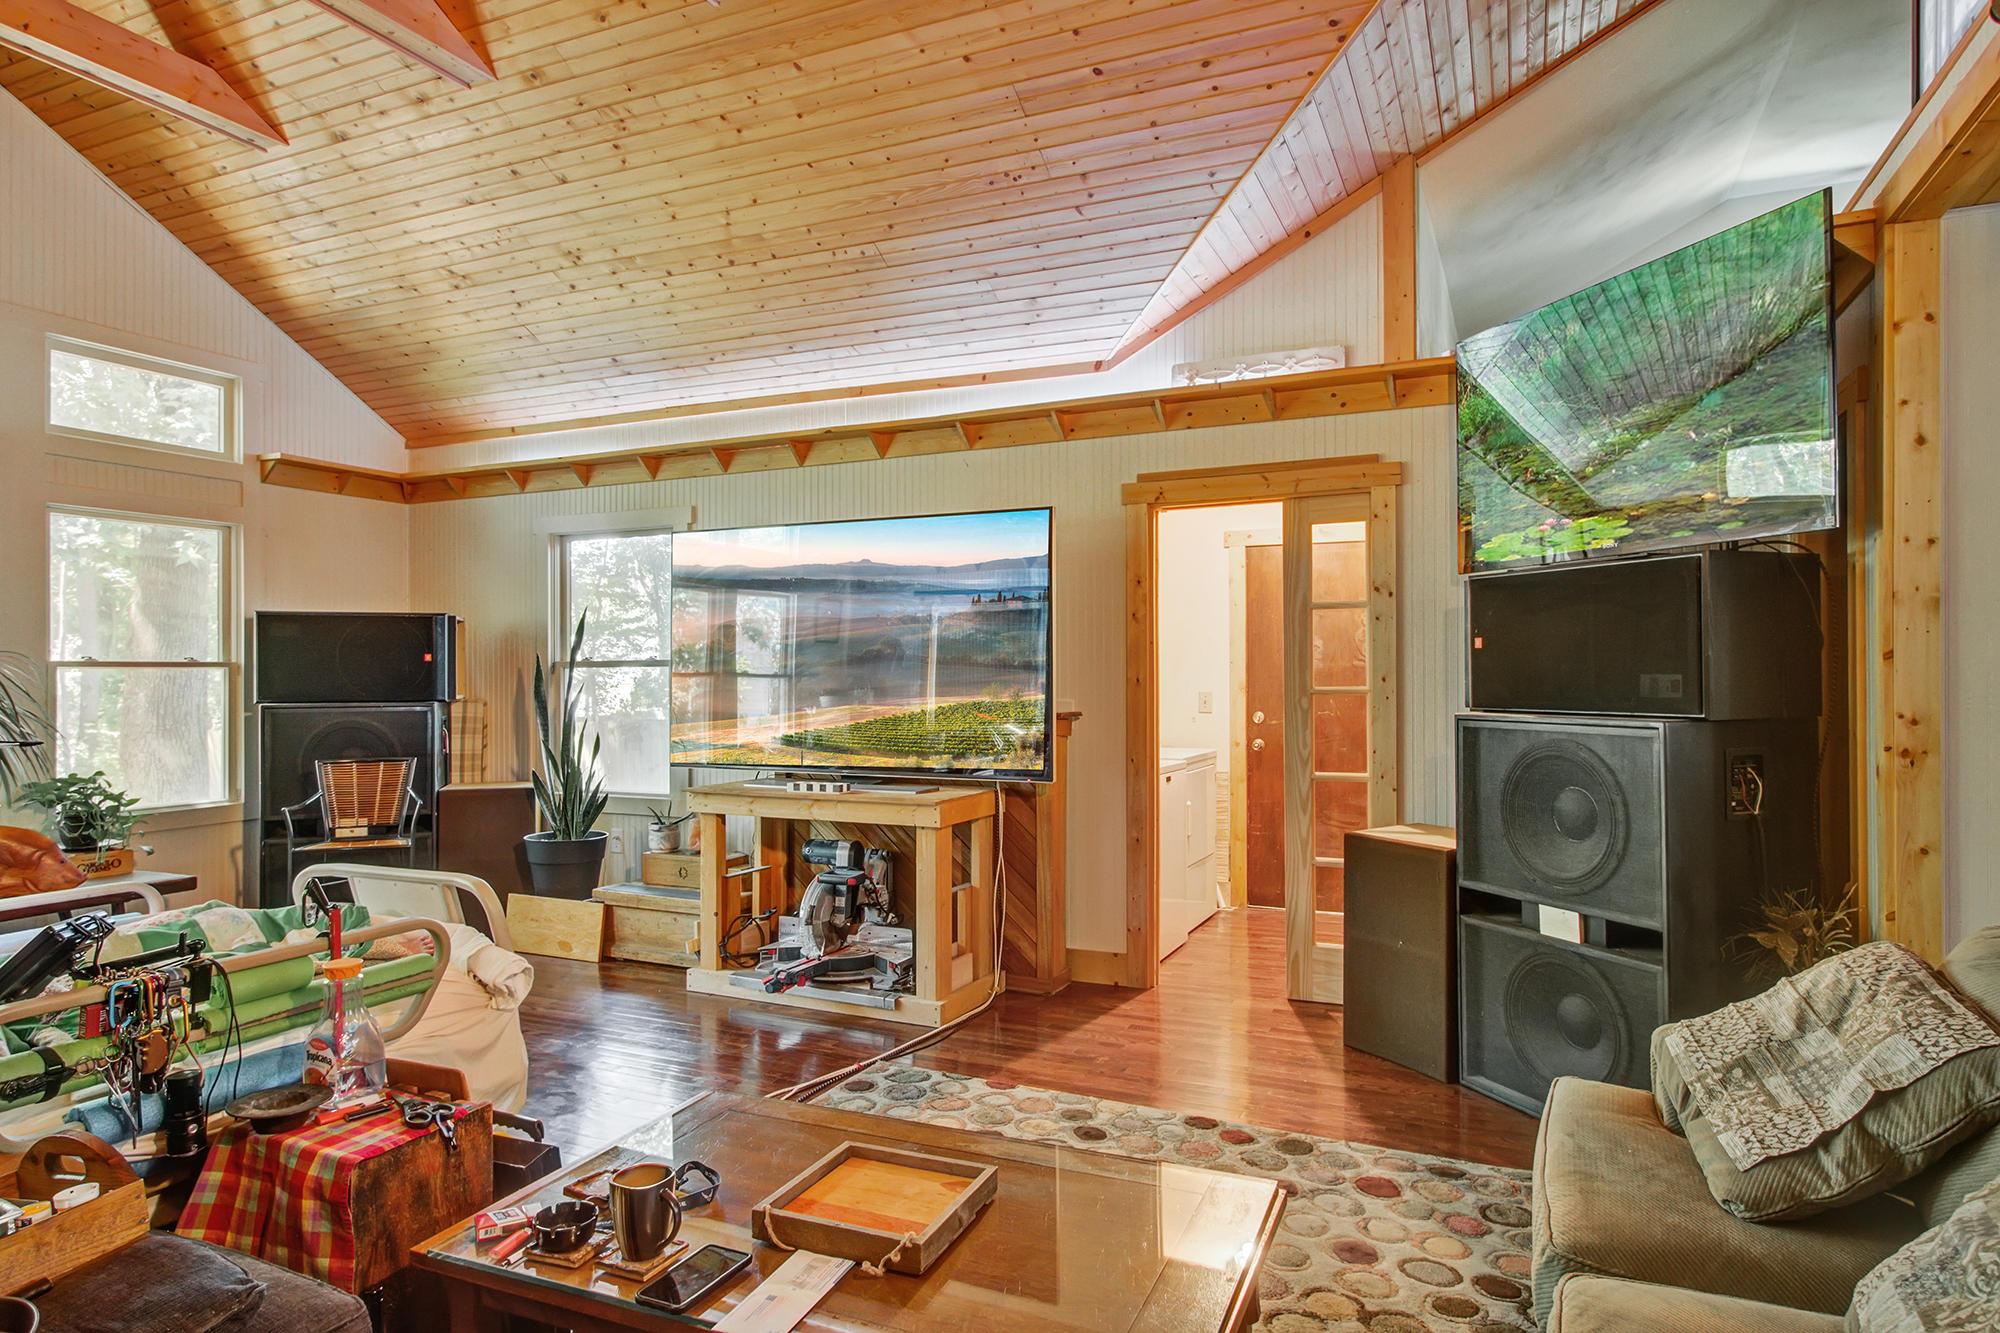 Wando Lakes Homes For Sale - 858 Fairlawn, Mount Pleasant, SC - 10